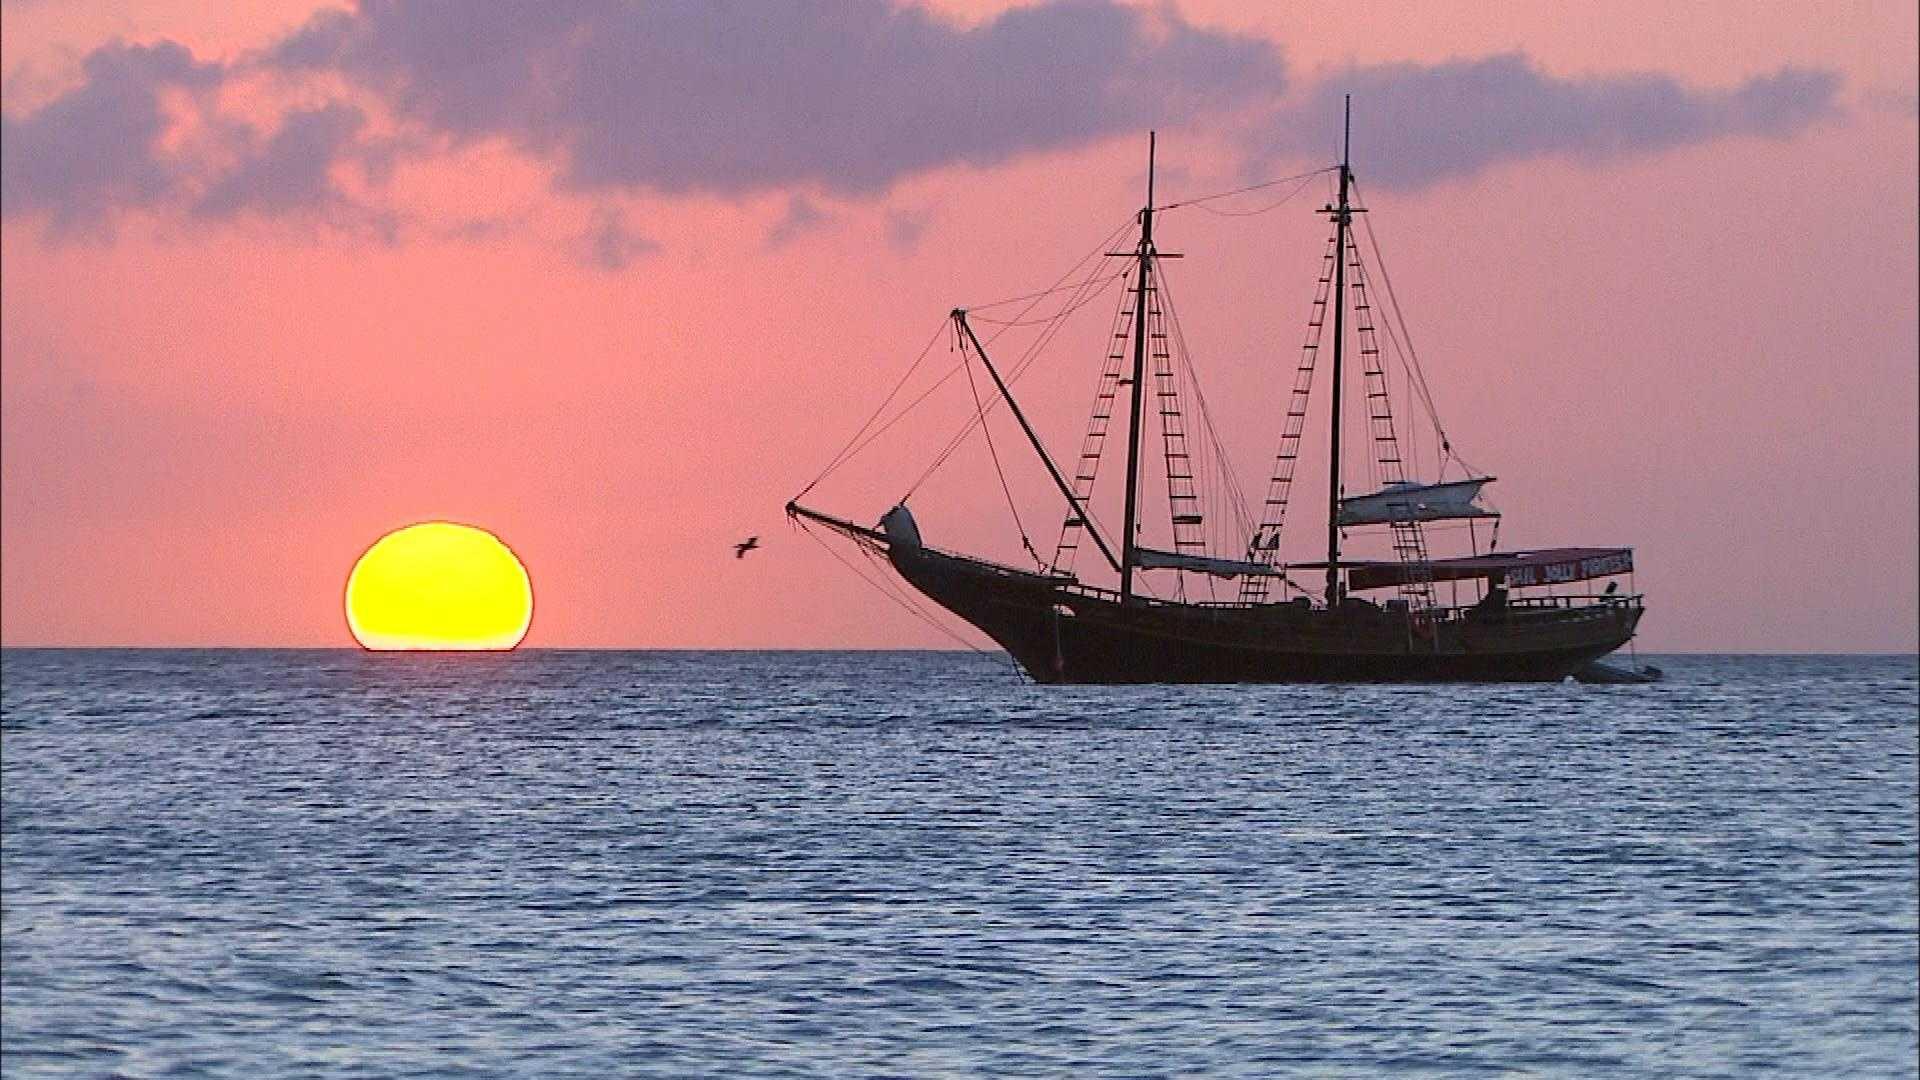 Monday, January 13: Aruba